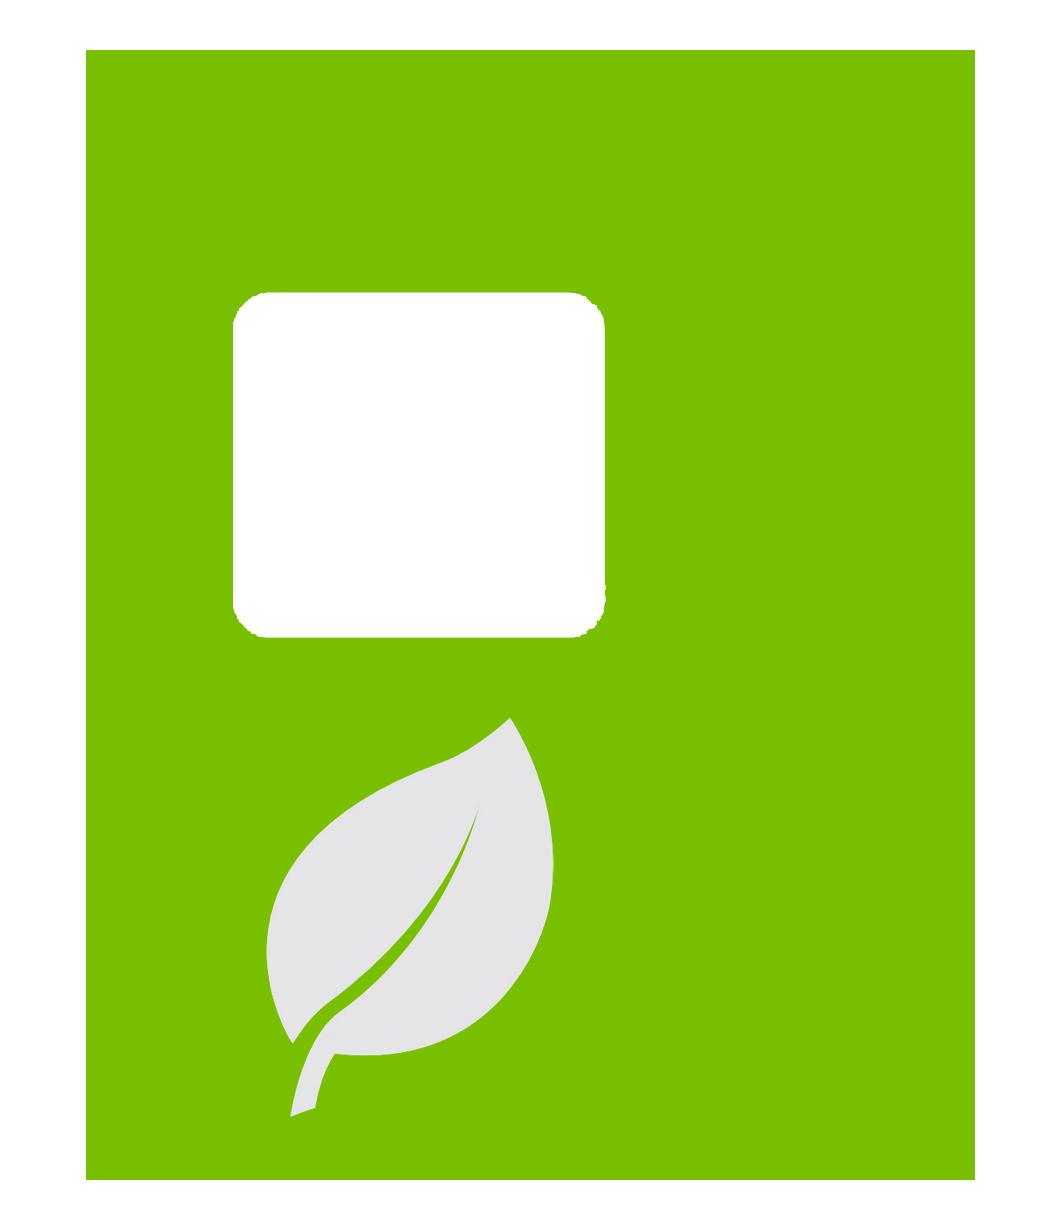 biofuel-pump-csp